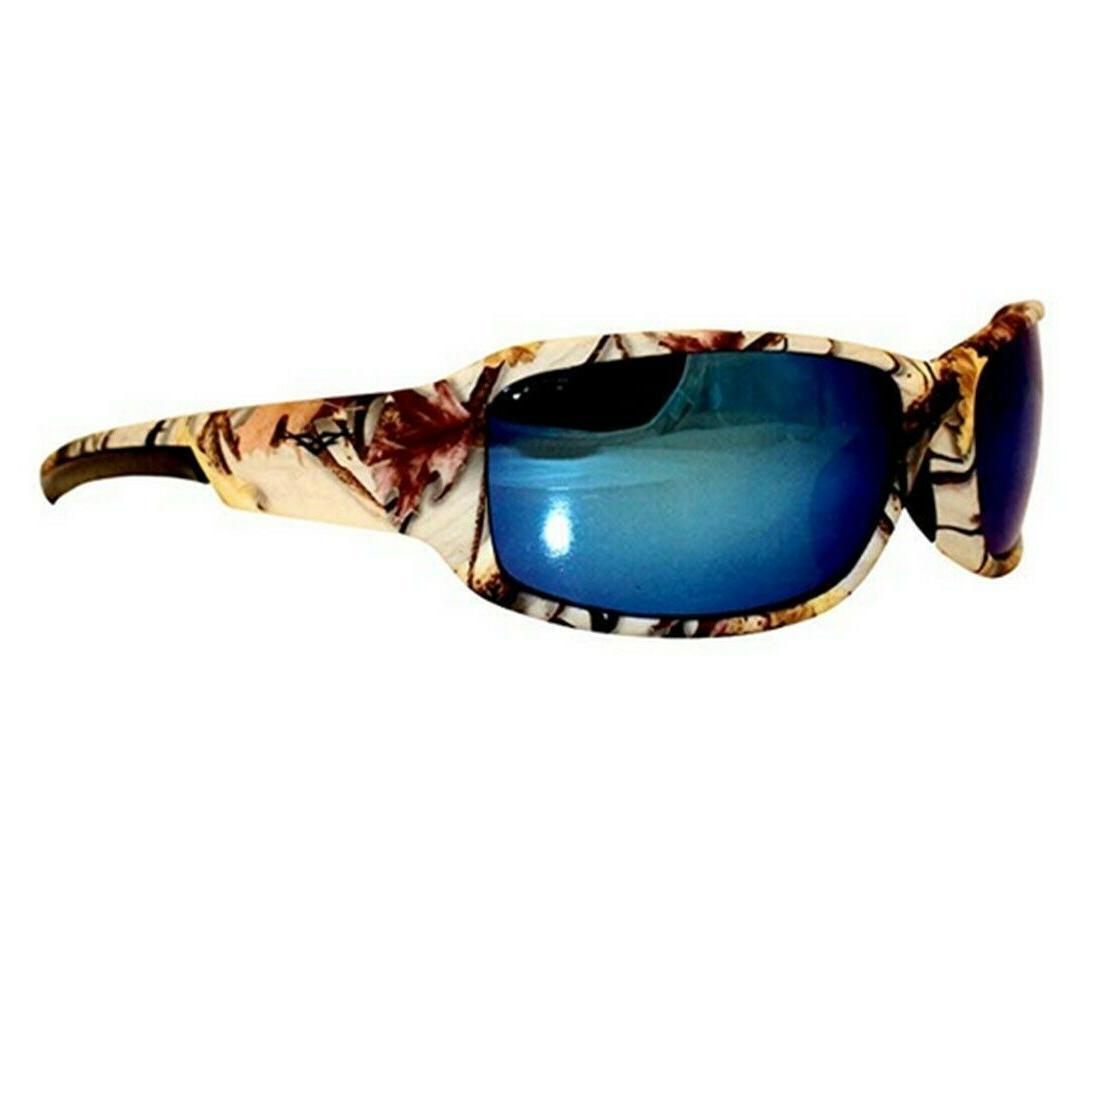 Bulk 12 Wholesales Choppers Sports Sunglasses